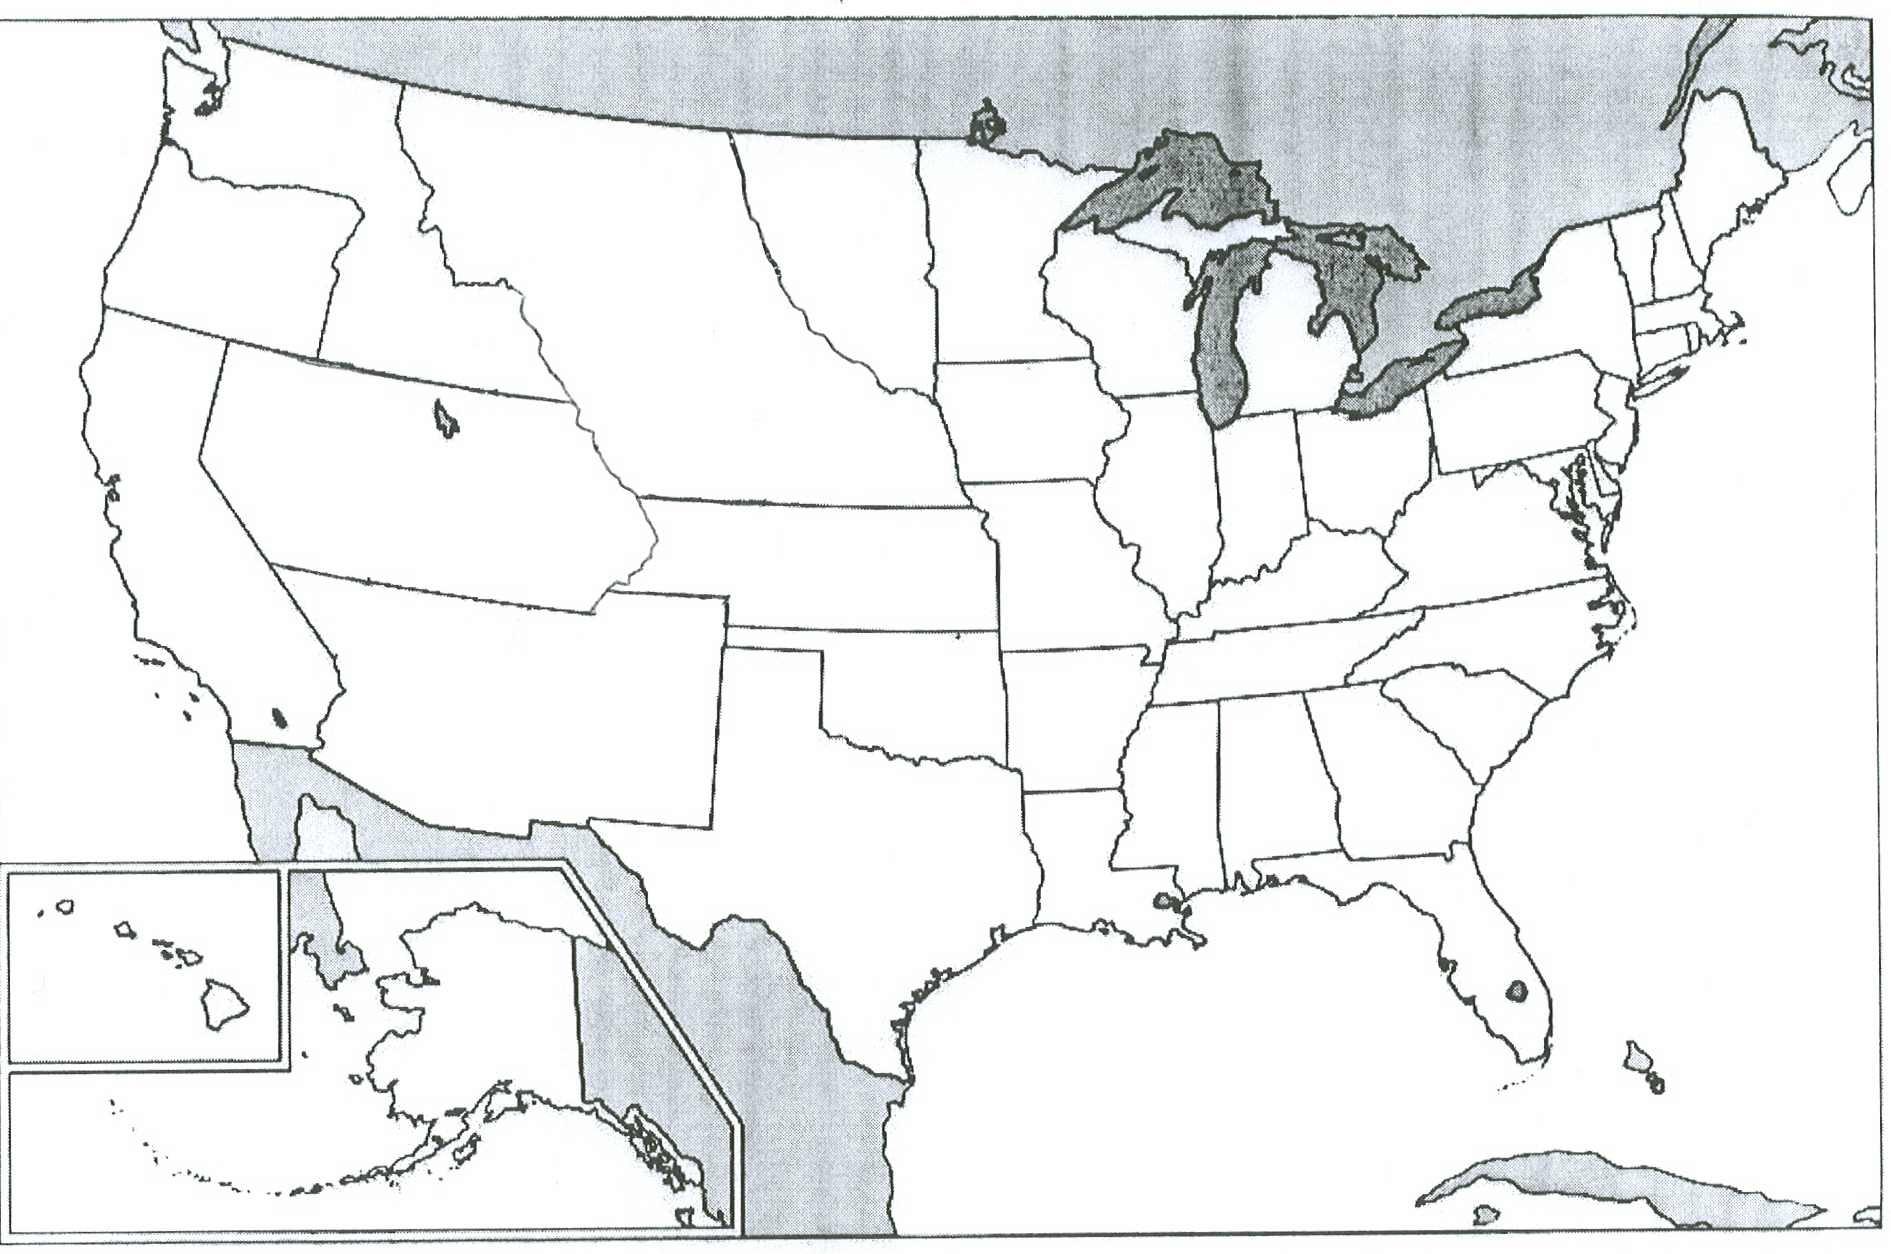 FileBlankMapUSAstatesPNG Wikimedia Commons United States Of USA - Blank us weather map